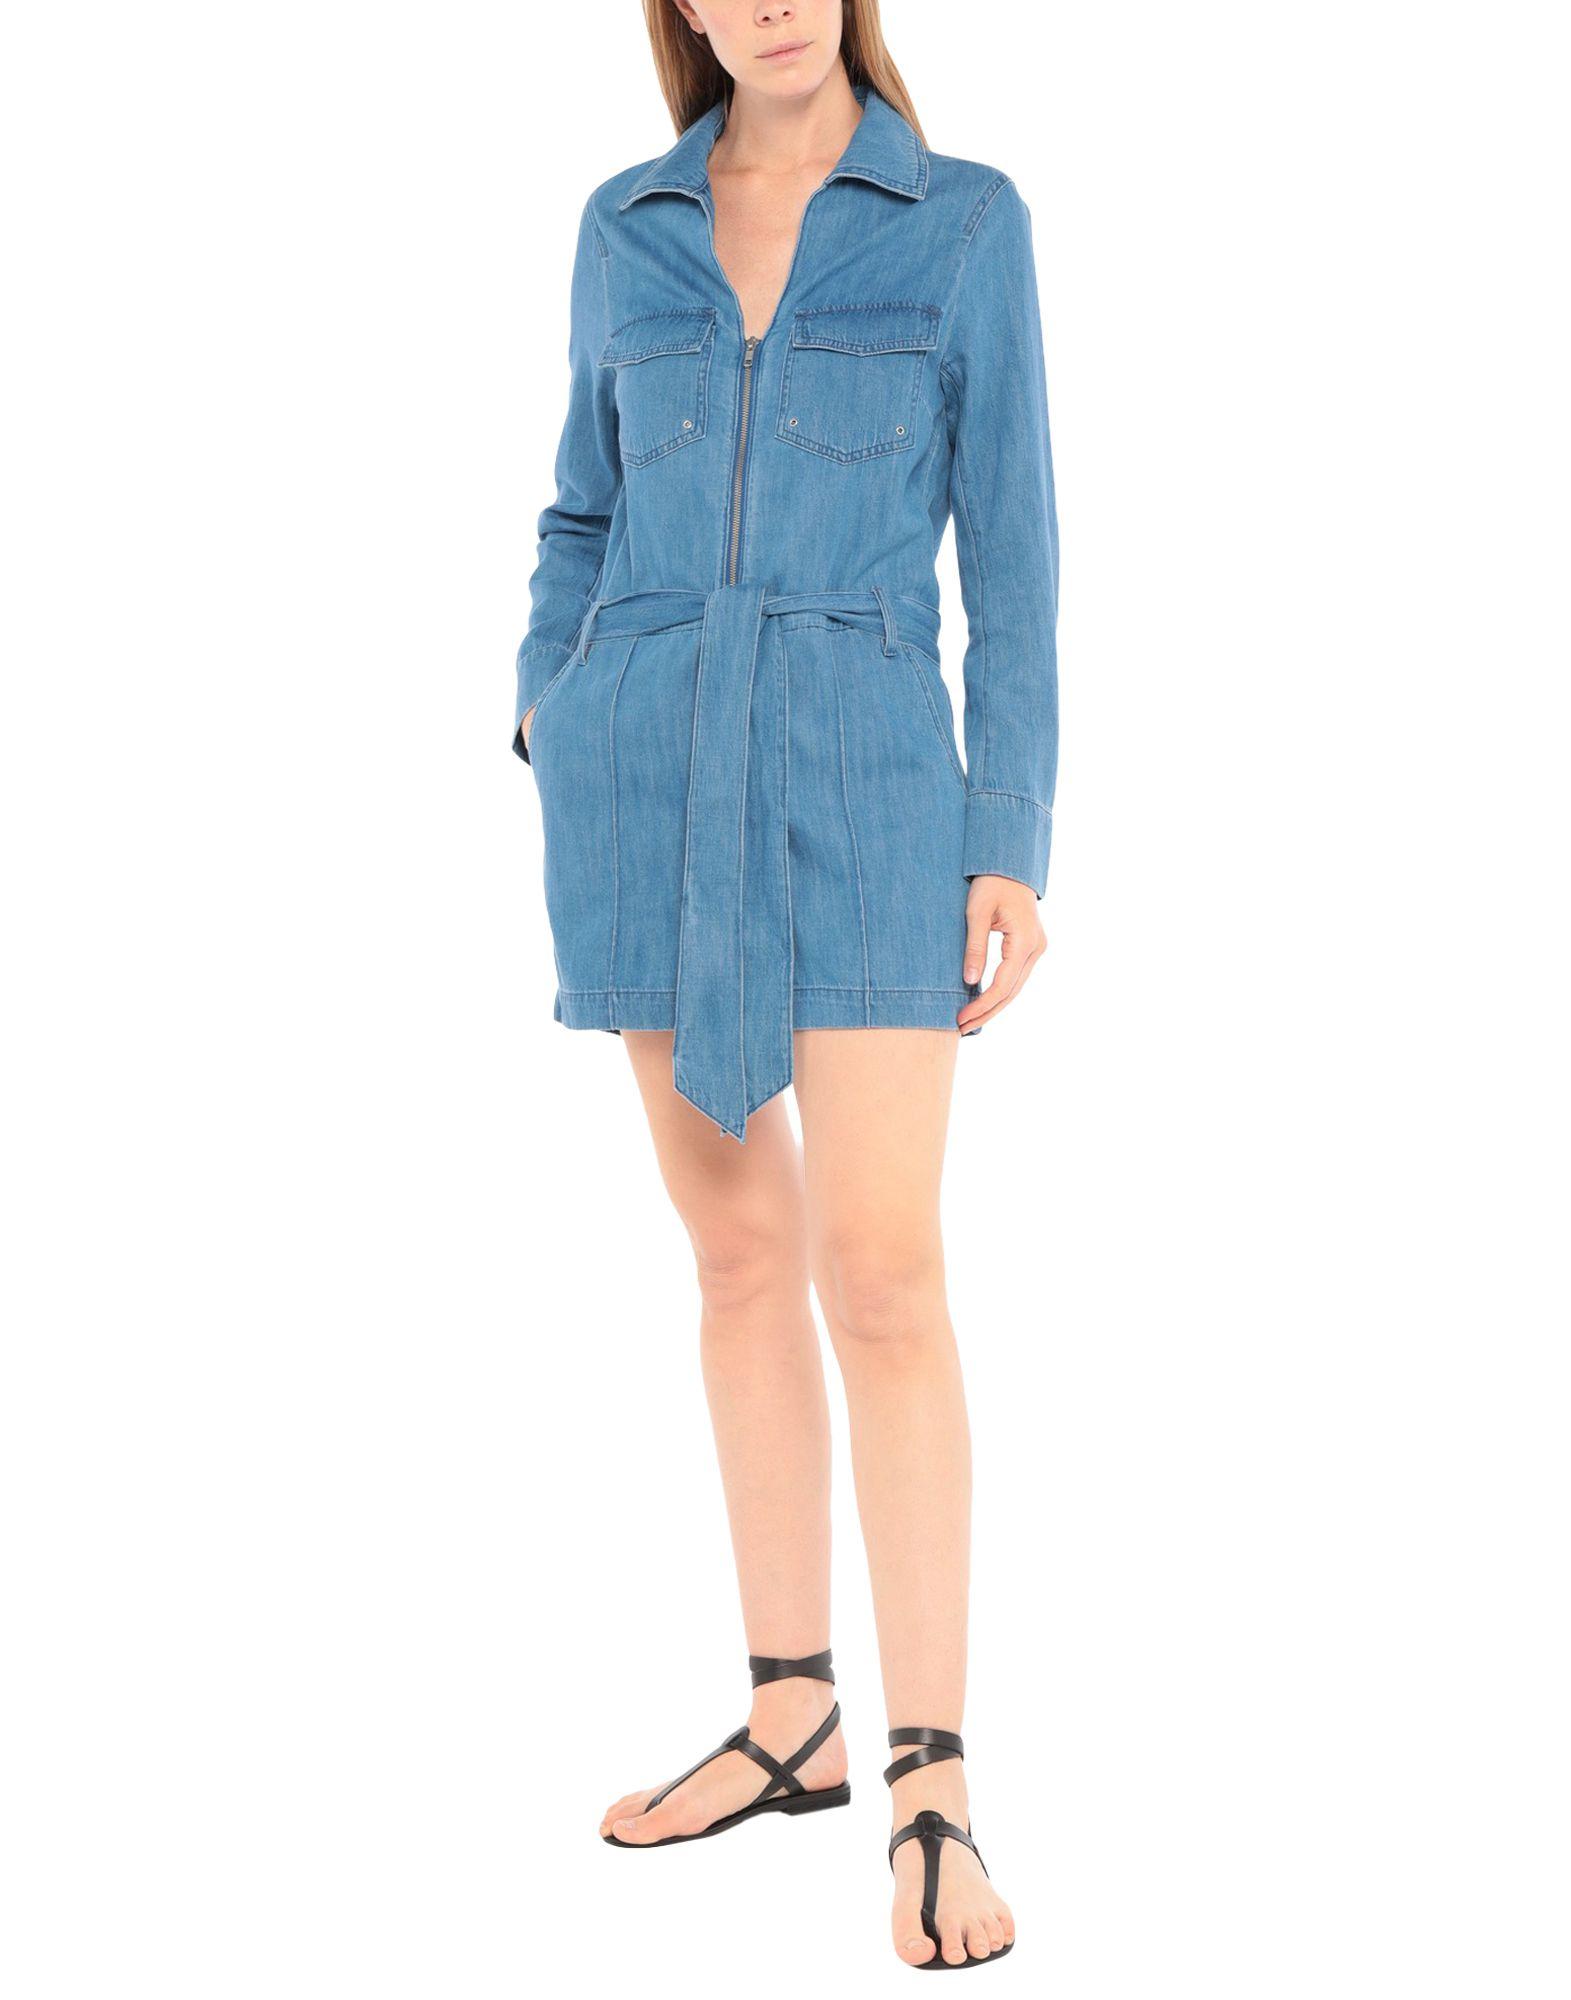 VERONICA BEARD Jumpsuits. denim, faded, belt, solid color, long sleeves, classic neckline, unlined, multipockets, zipper closure, front closure. 88% Cotton, 12% Linen